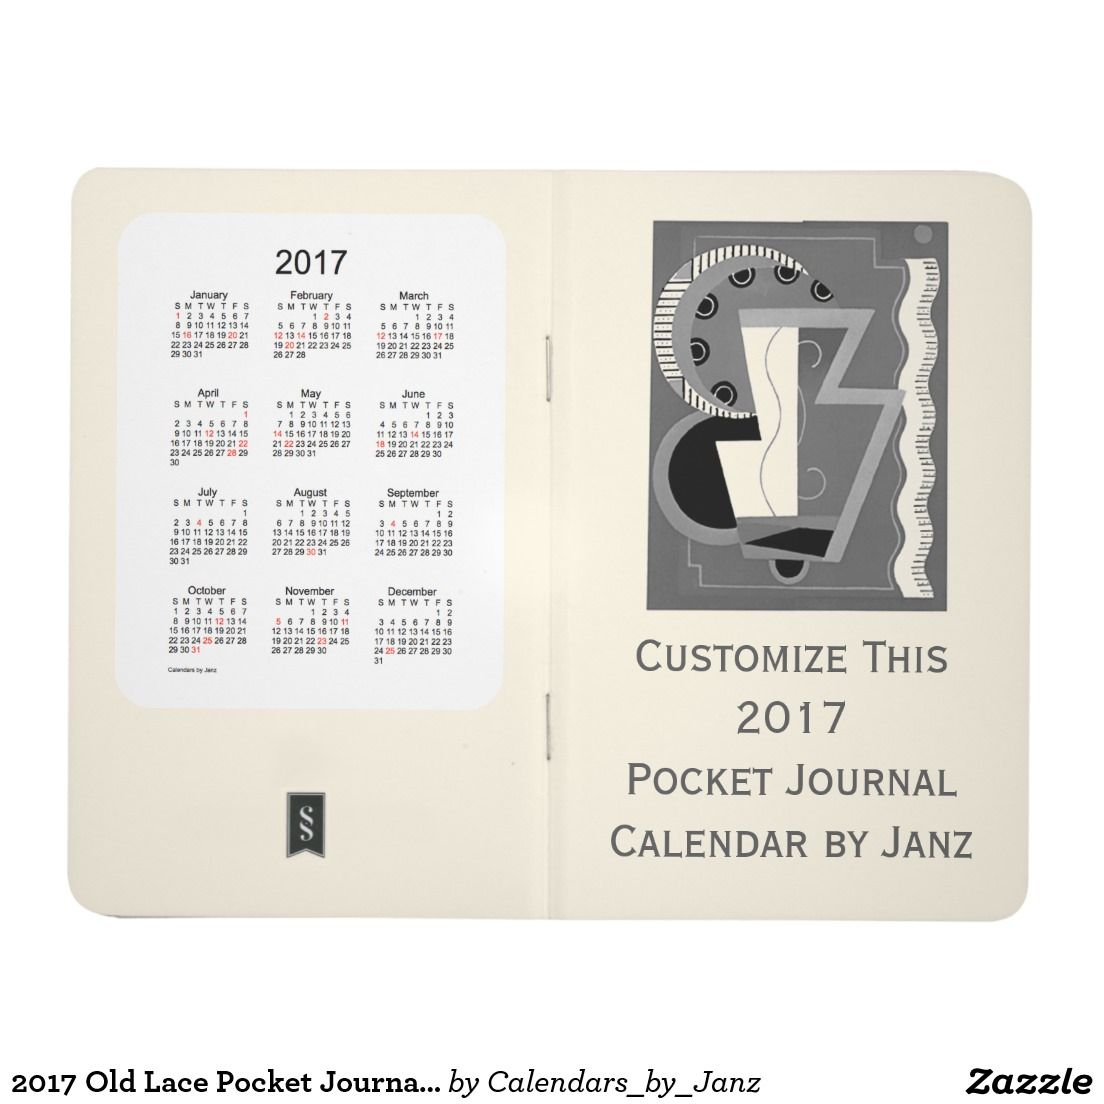 2017 Old Lace Pocket Journal Calendar by Janz